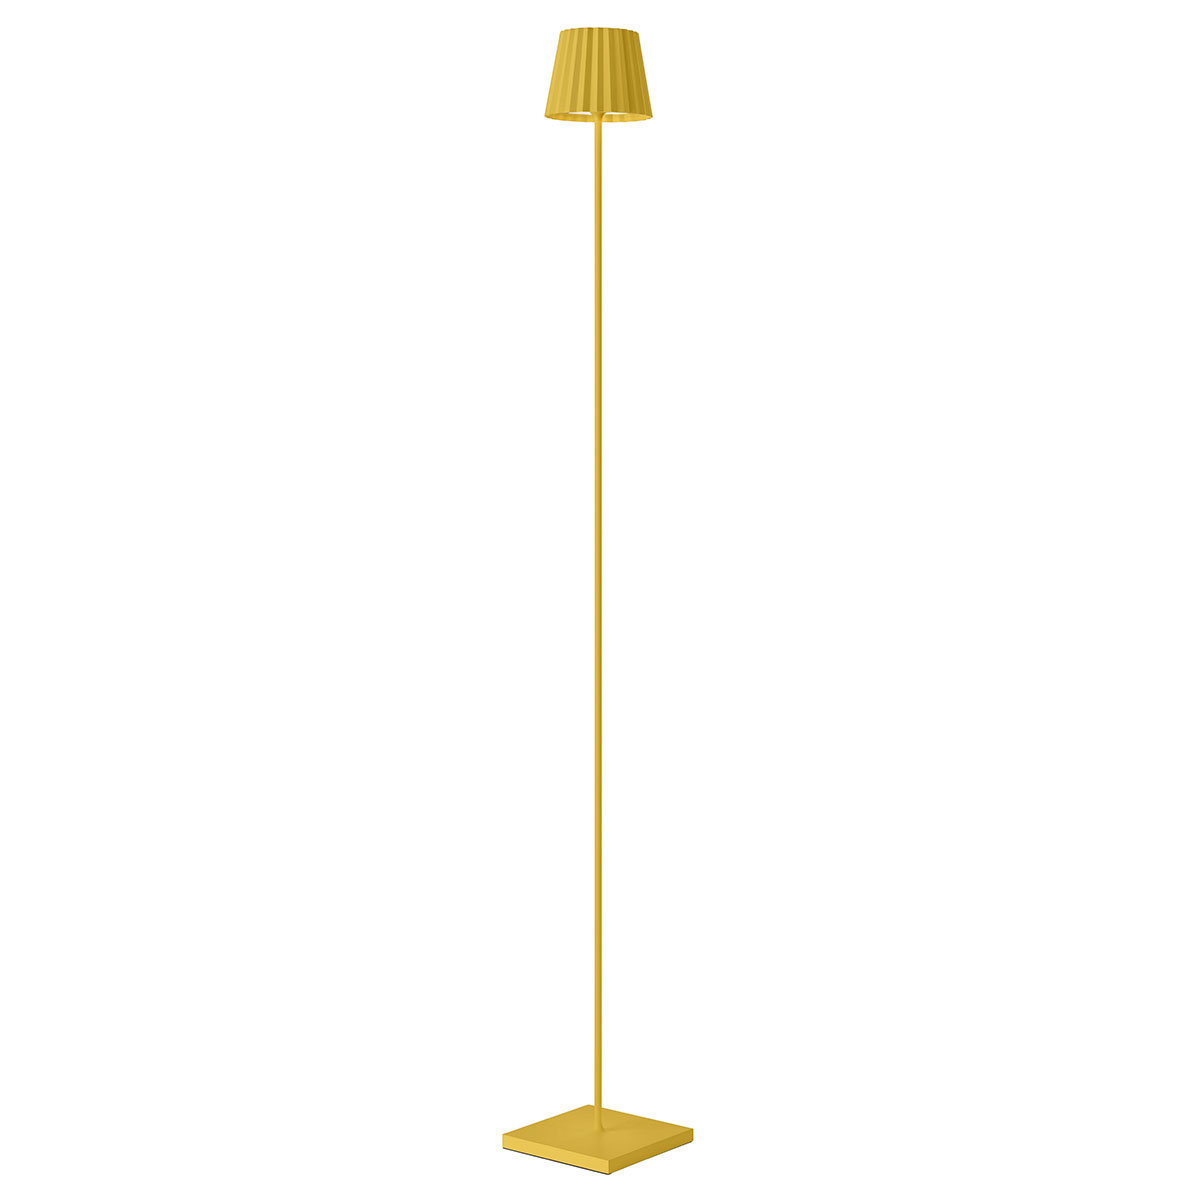 Akku Stehleuchte Troll, 120x15x15 cm, Aluminium, gelb